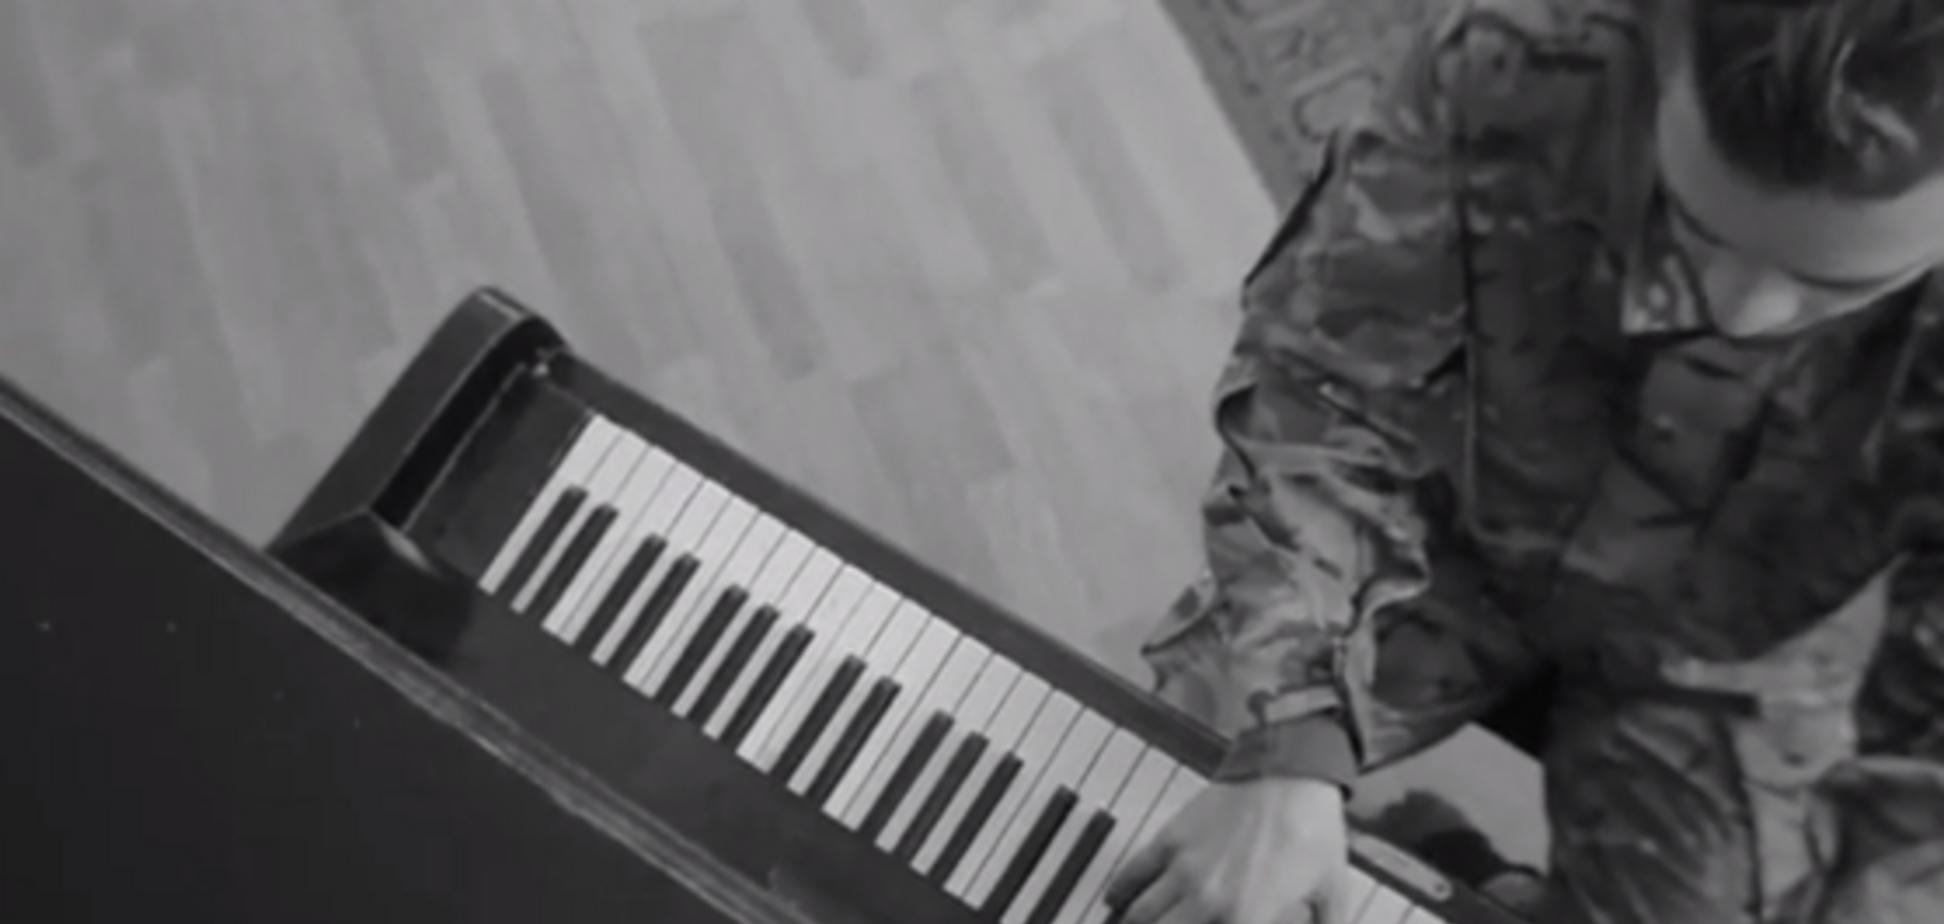 'Лунная соната' от гранатометчика из 'Донбасса': плакали даже боевики. Видео